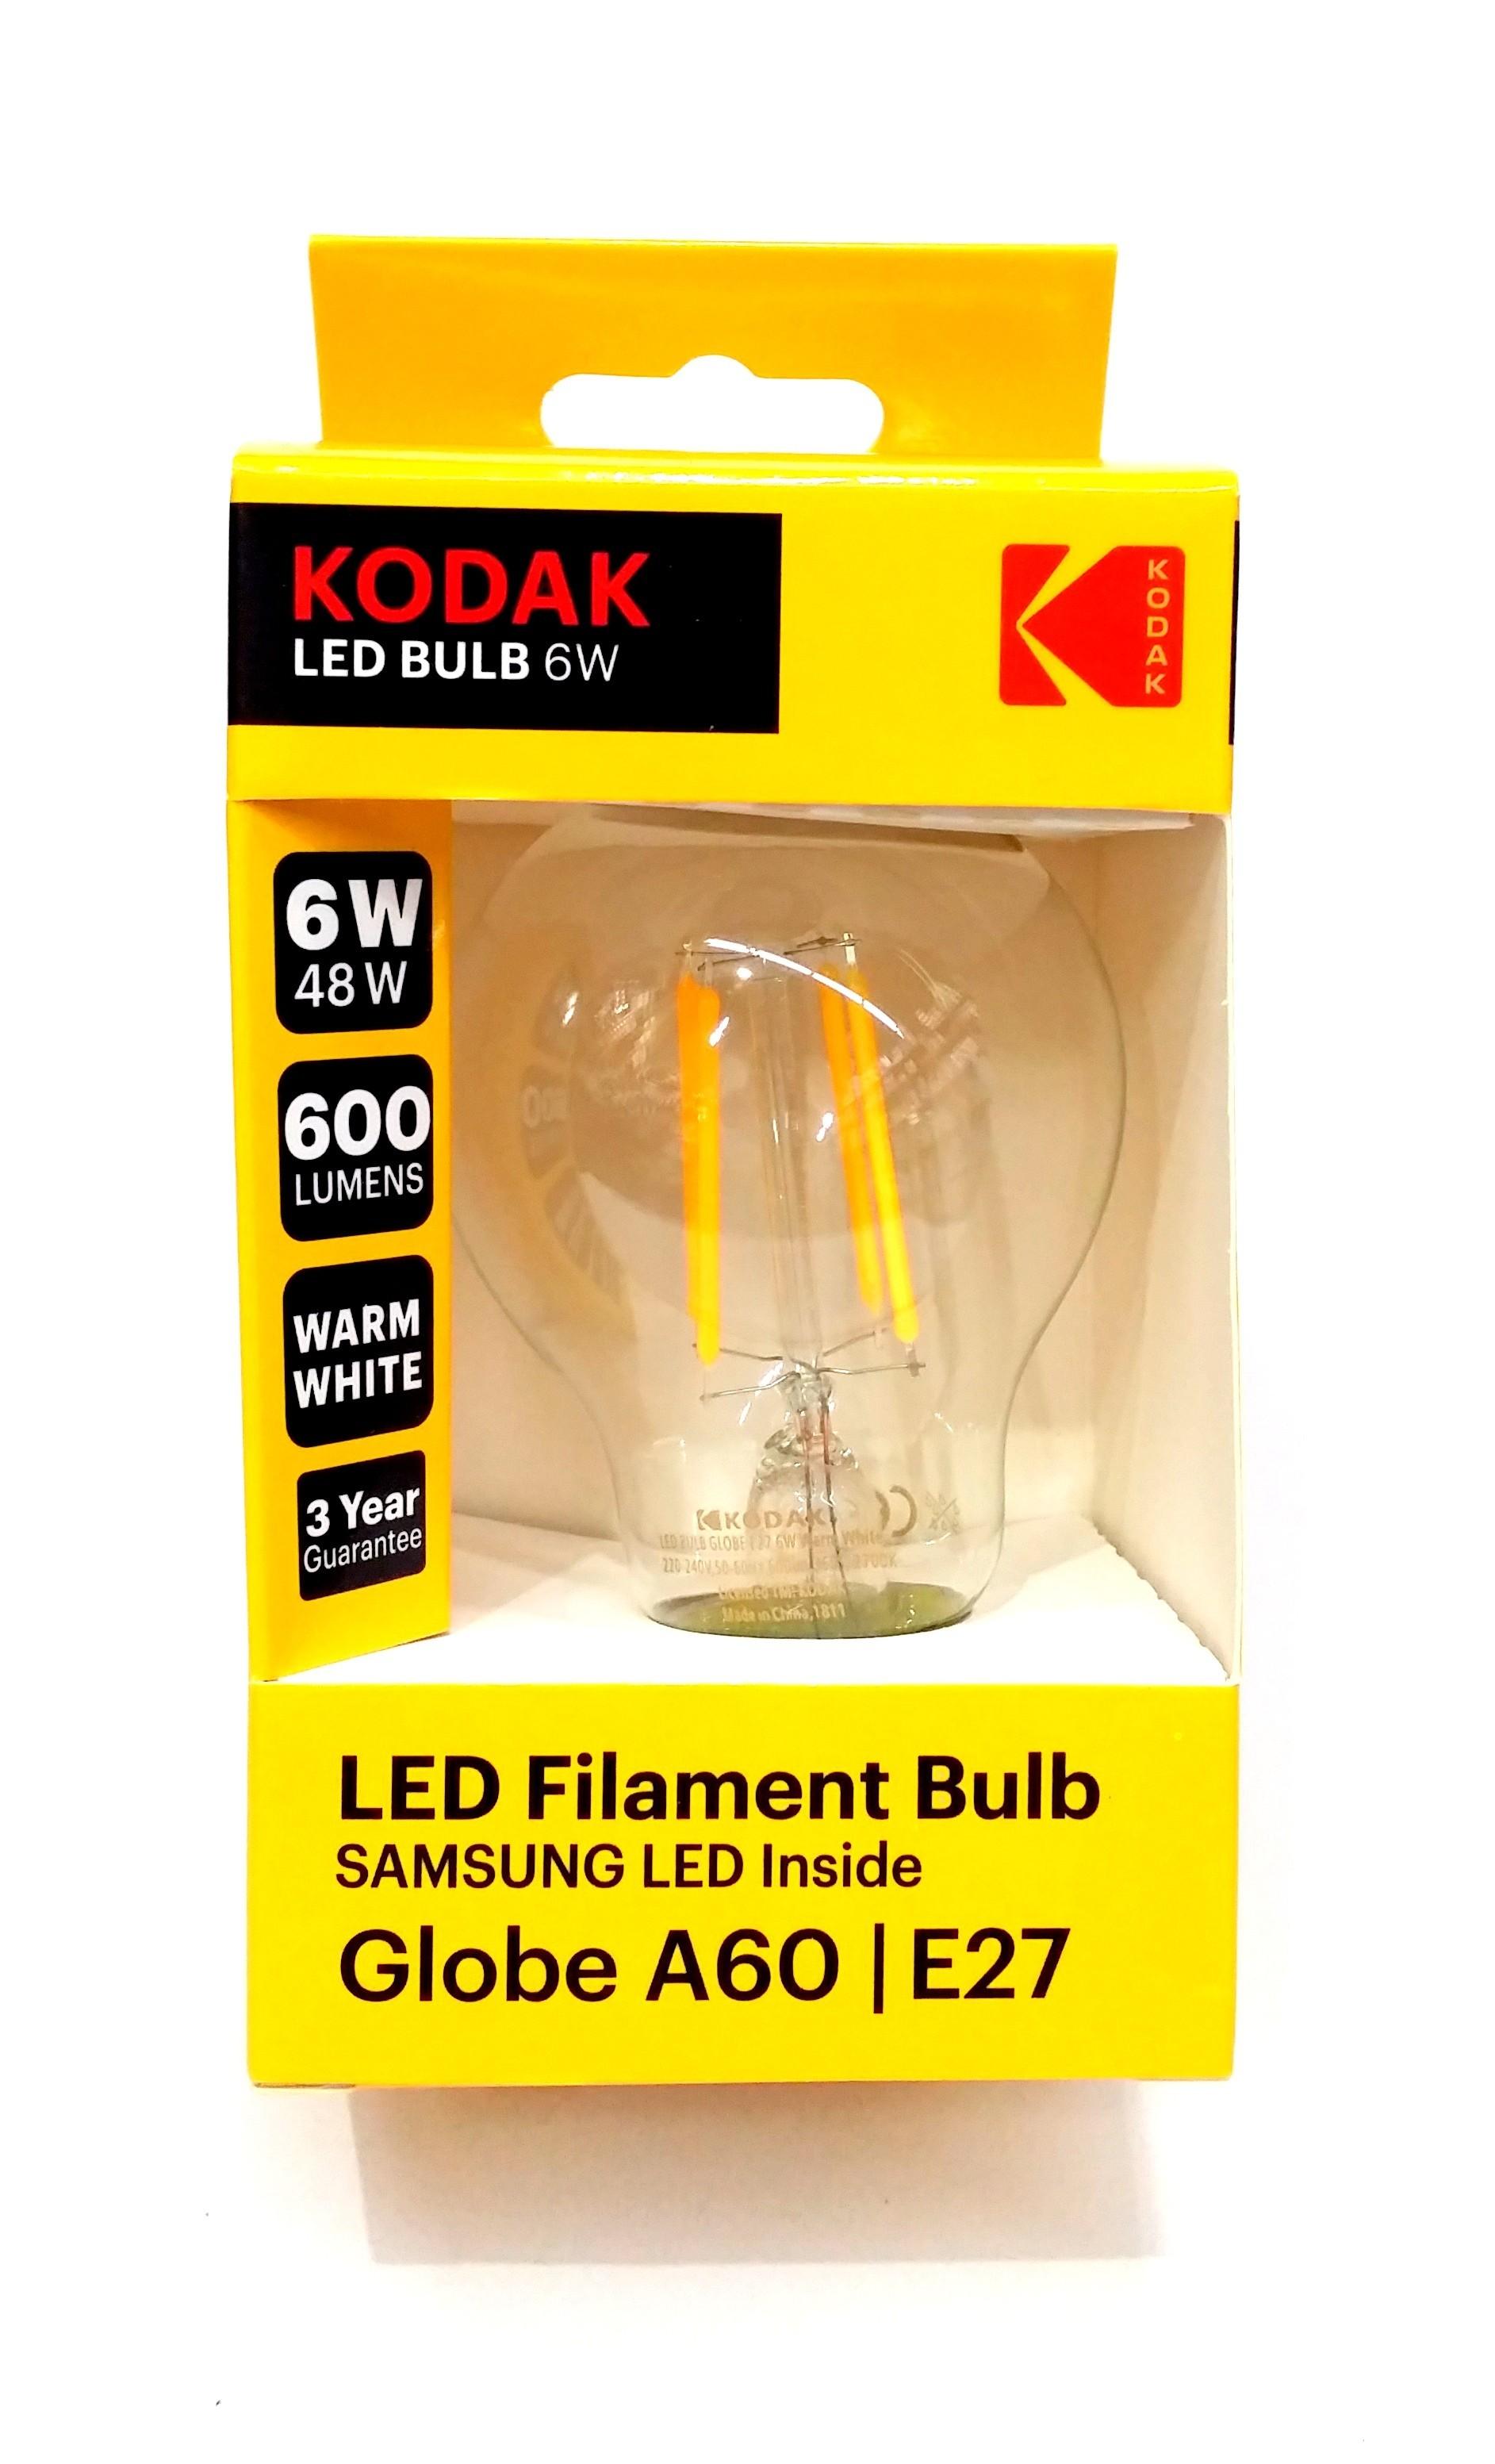 Kodak Bec Led A 60 E 27 600 Lm 6 W Filament Clear/Warm 30419186 imagine techstar.ro 2021